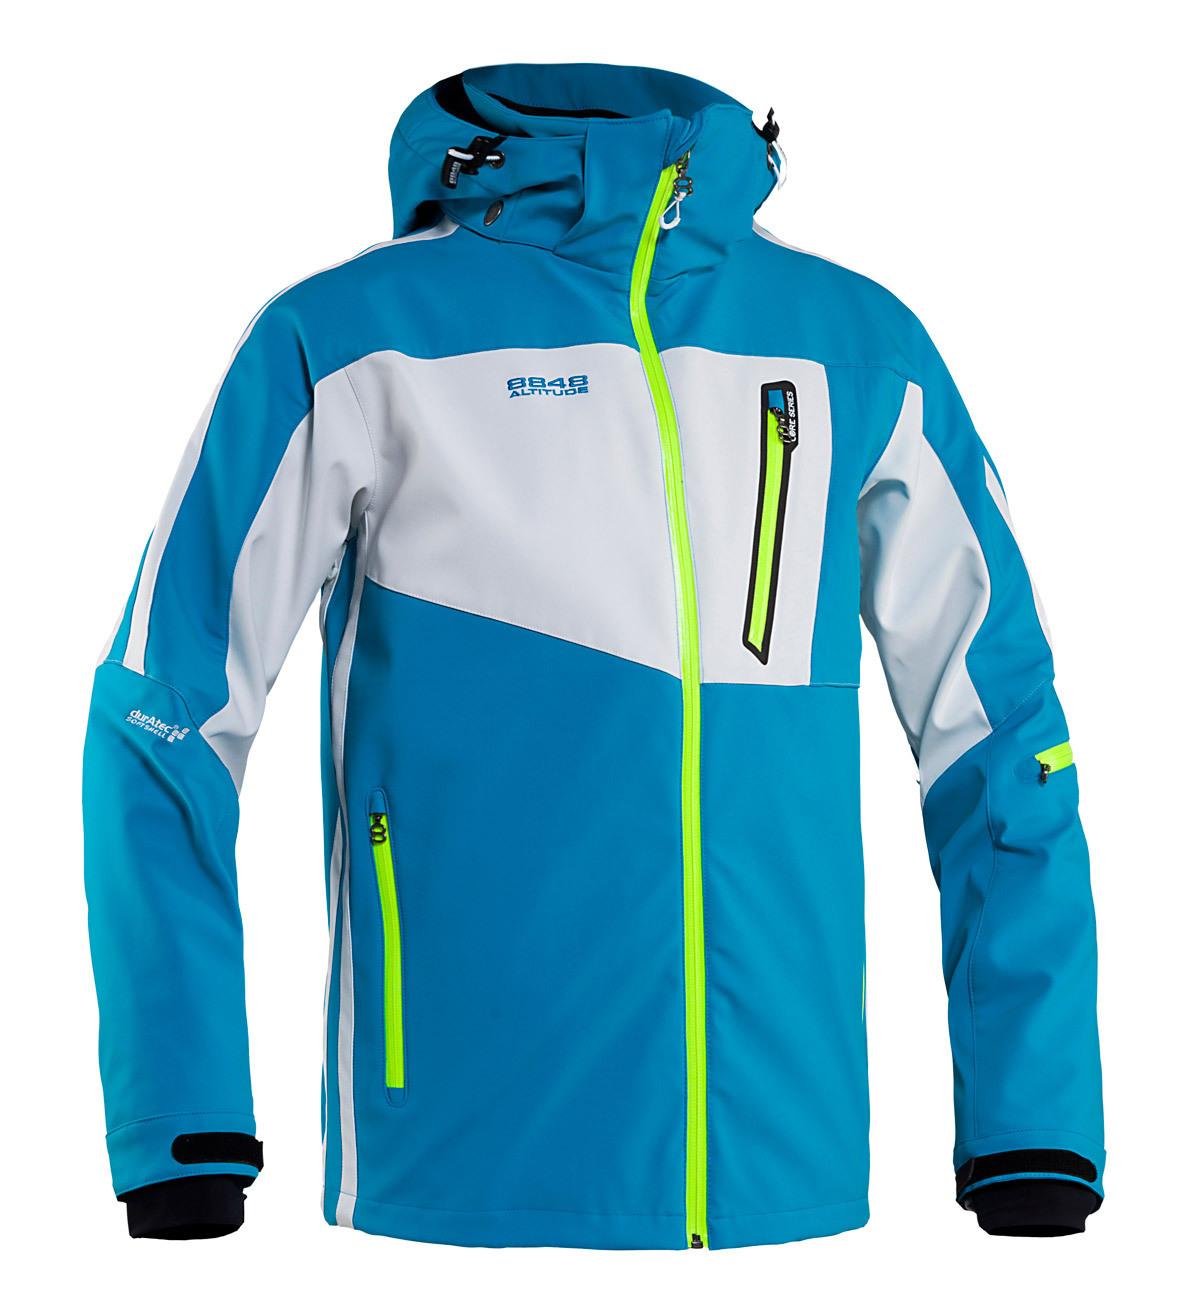 Горнолыжная куртка 8848 Altitude Steam Turquoise